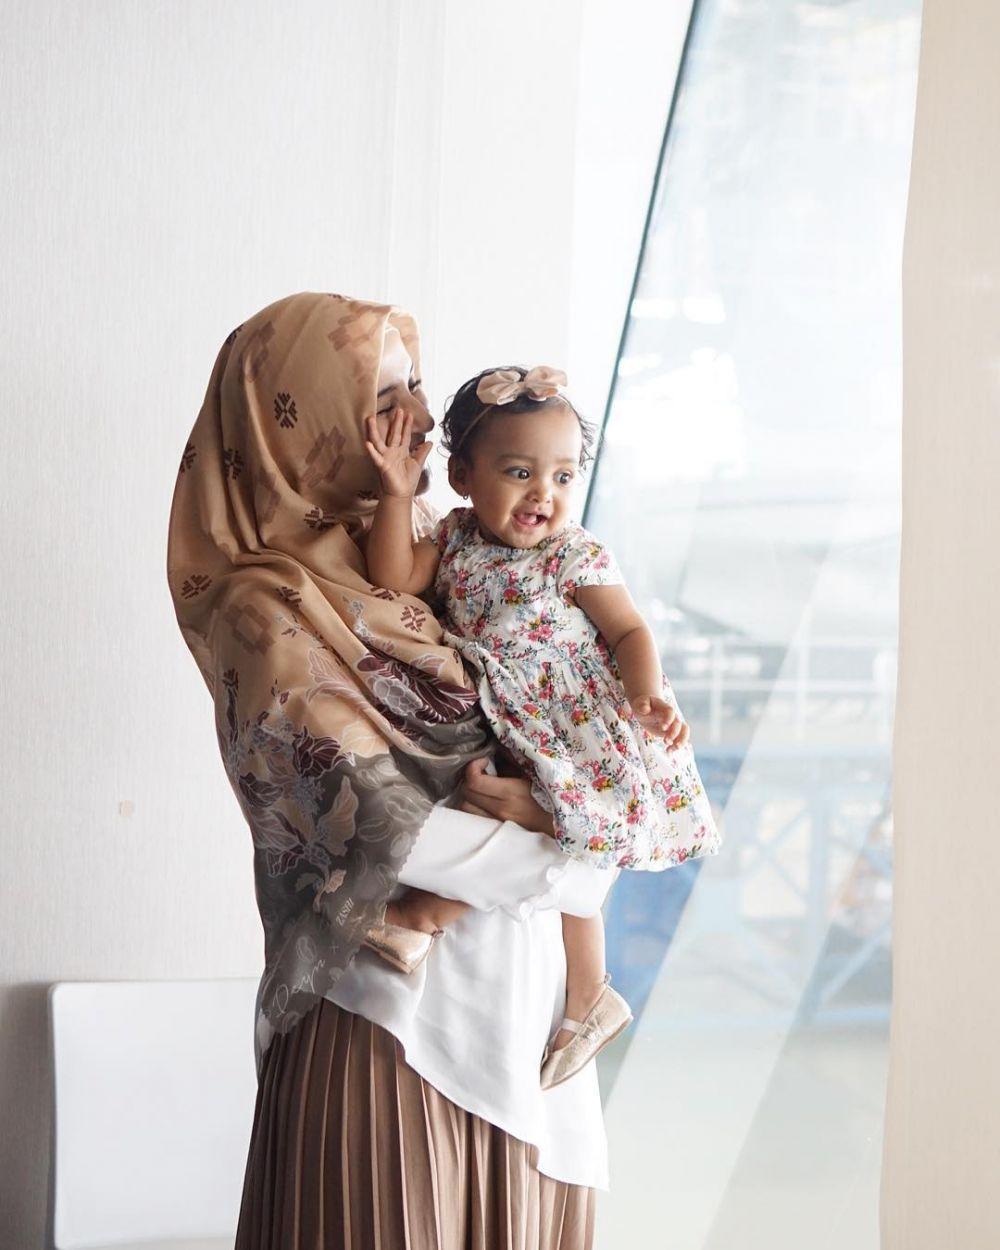 Cara Shireen Sungkar didik anak © 2019 brilio.net